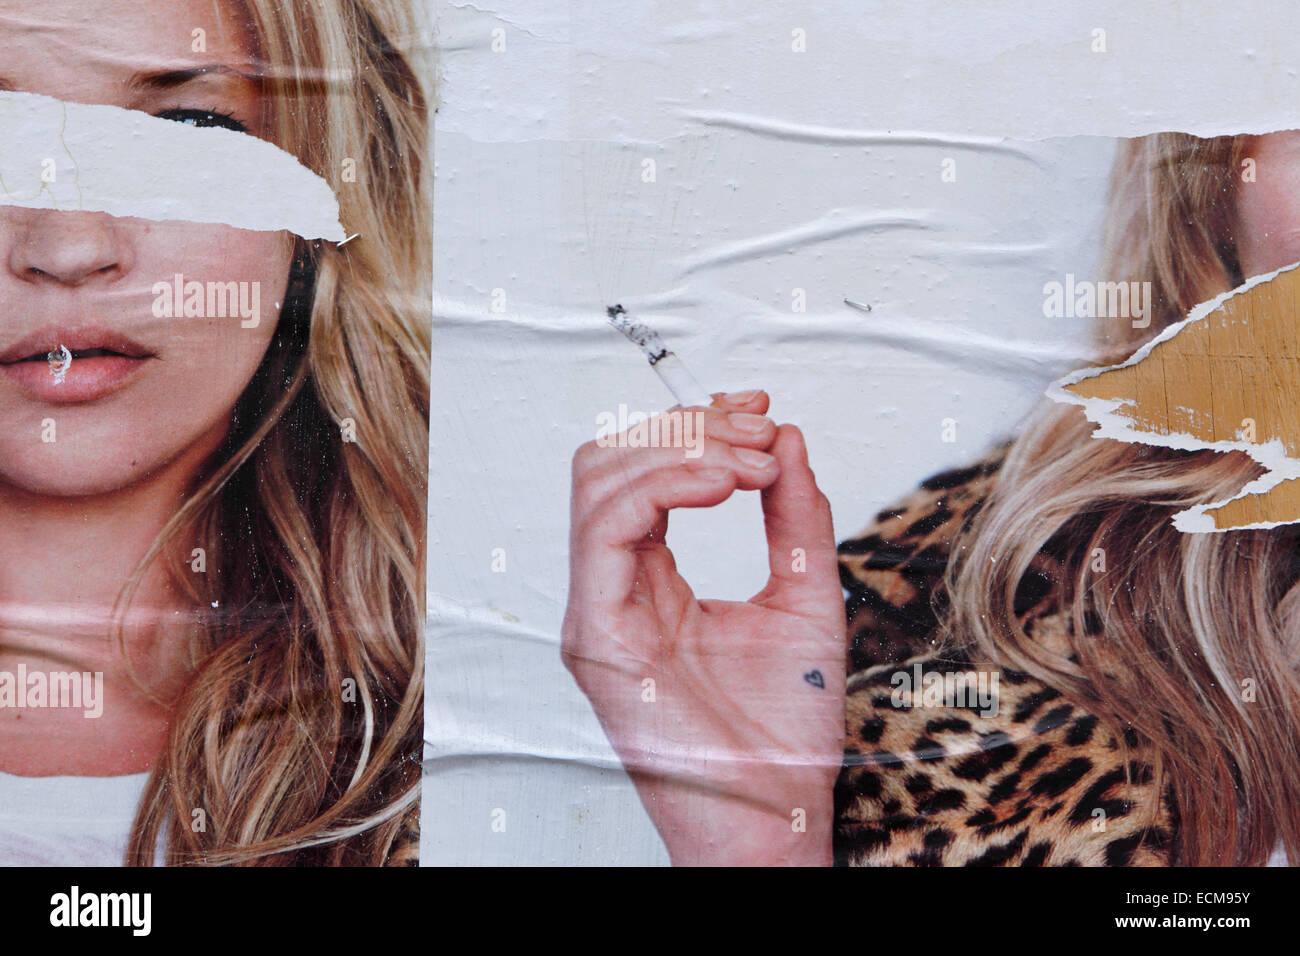 Torn billboard advertising poster of woman smoking cigarette - Stock Image